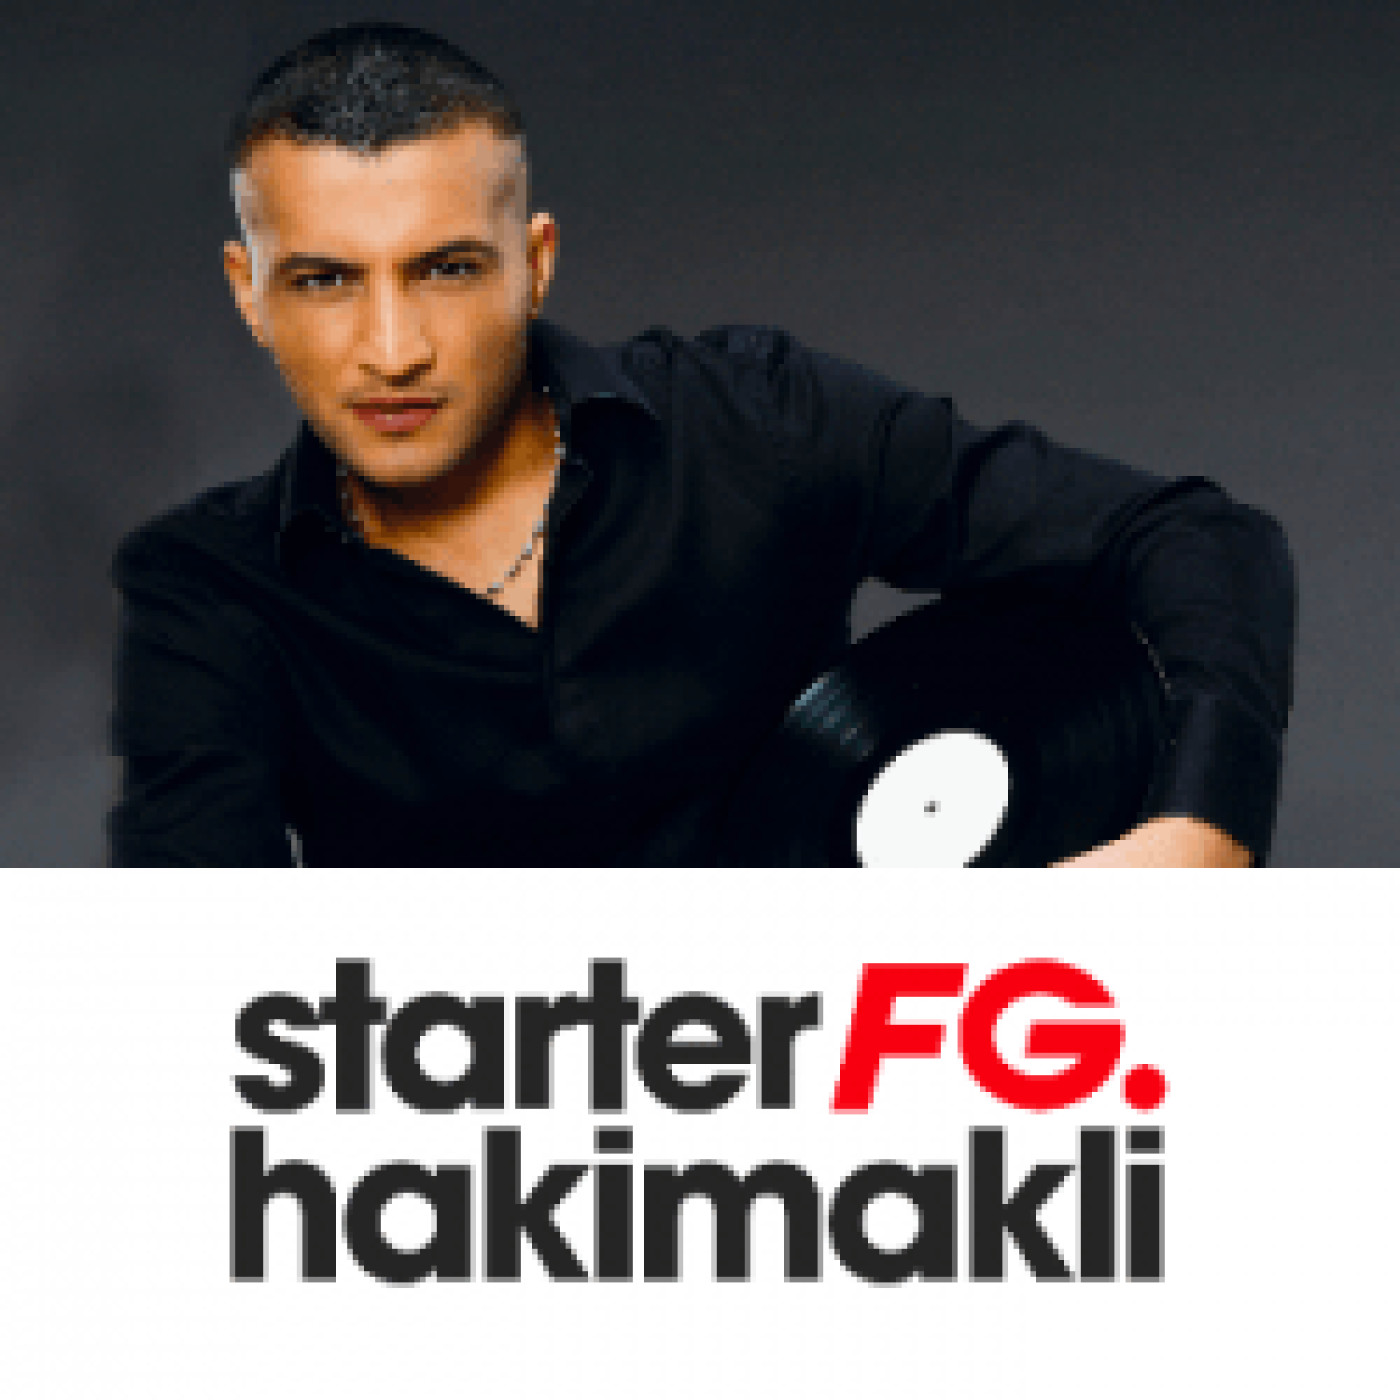 STARTER FG BY HAKIMAKLI MARDI 5 JANVIER 2021